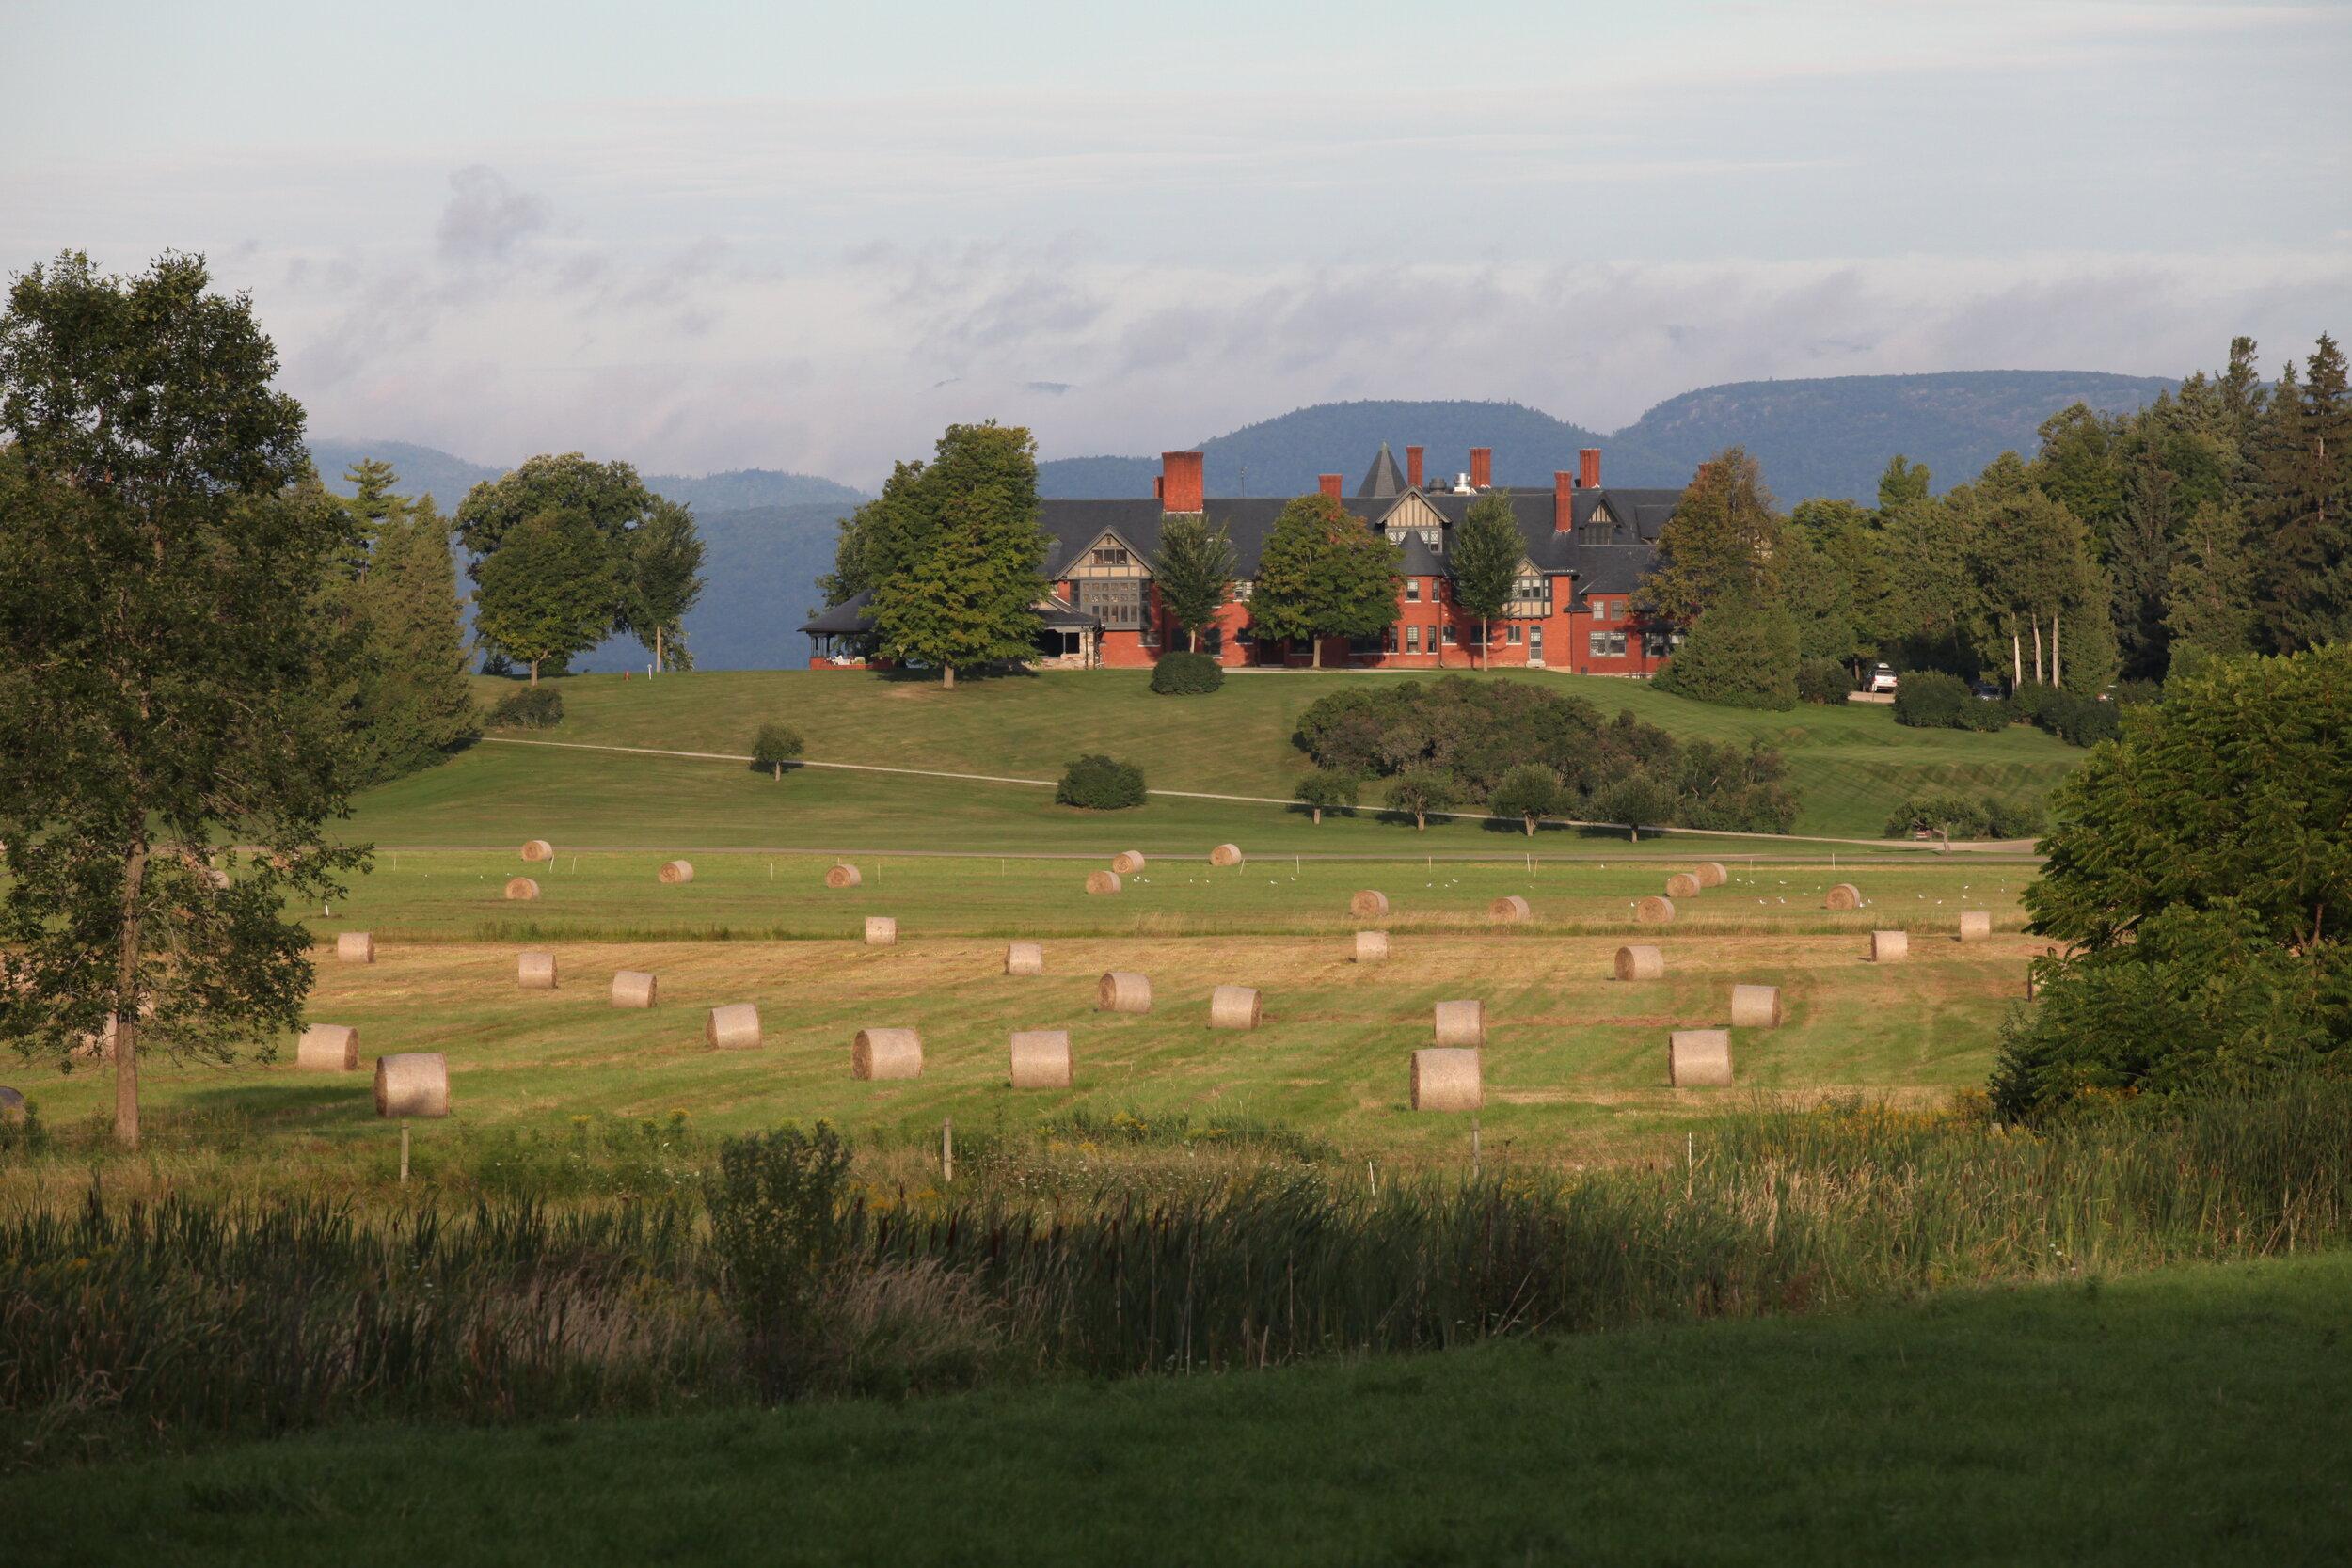 the_inn_at_shelburne_farms_round_bales_credit_marshall_webb.jpg